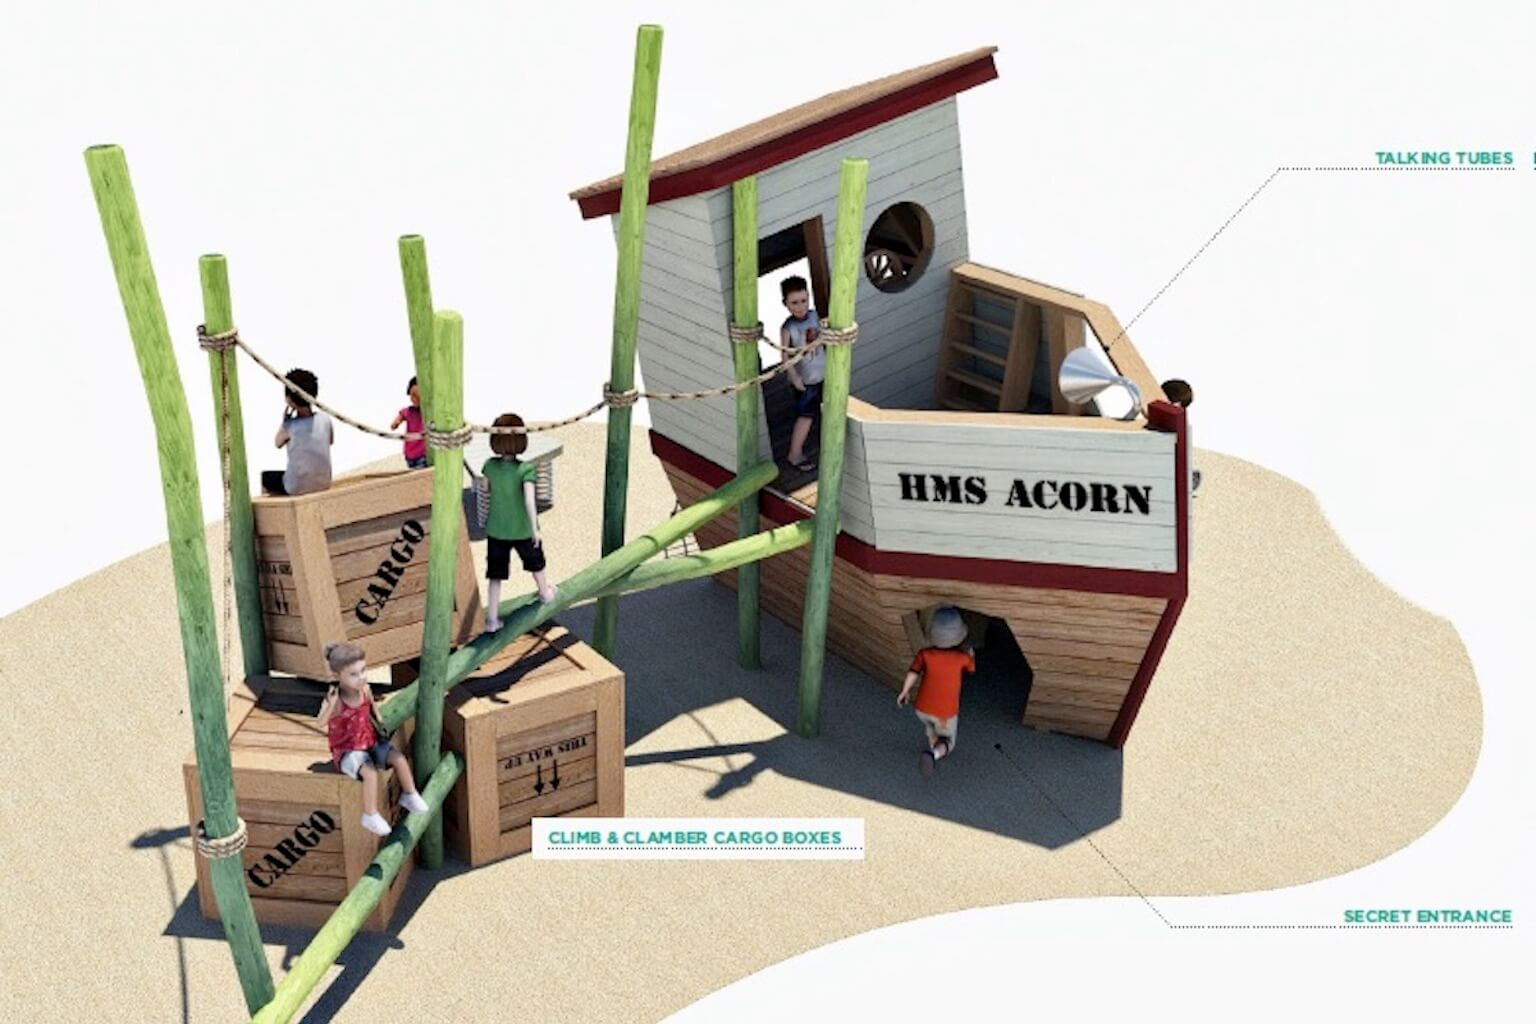 The Plan for HMS Acorn